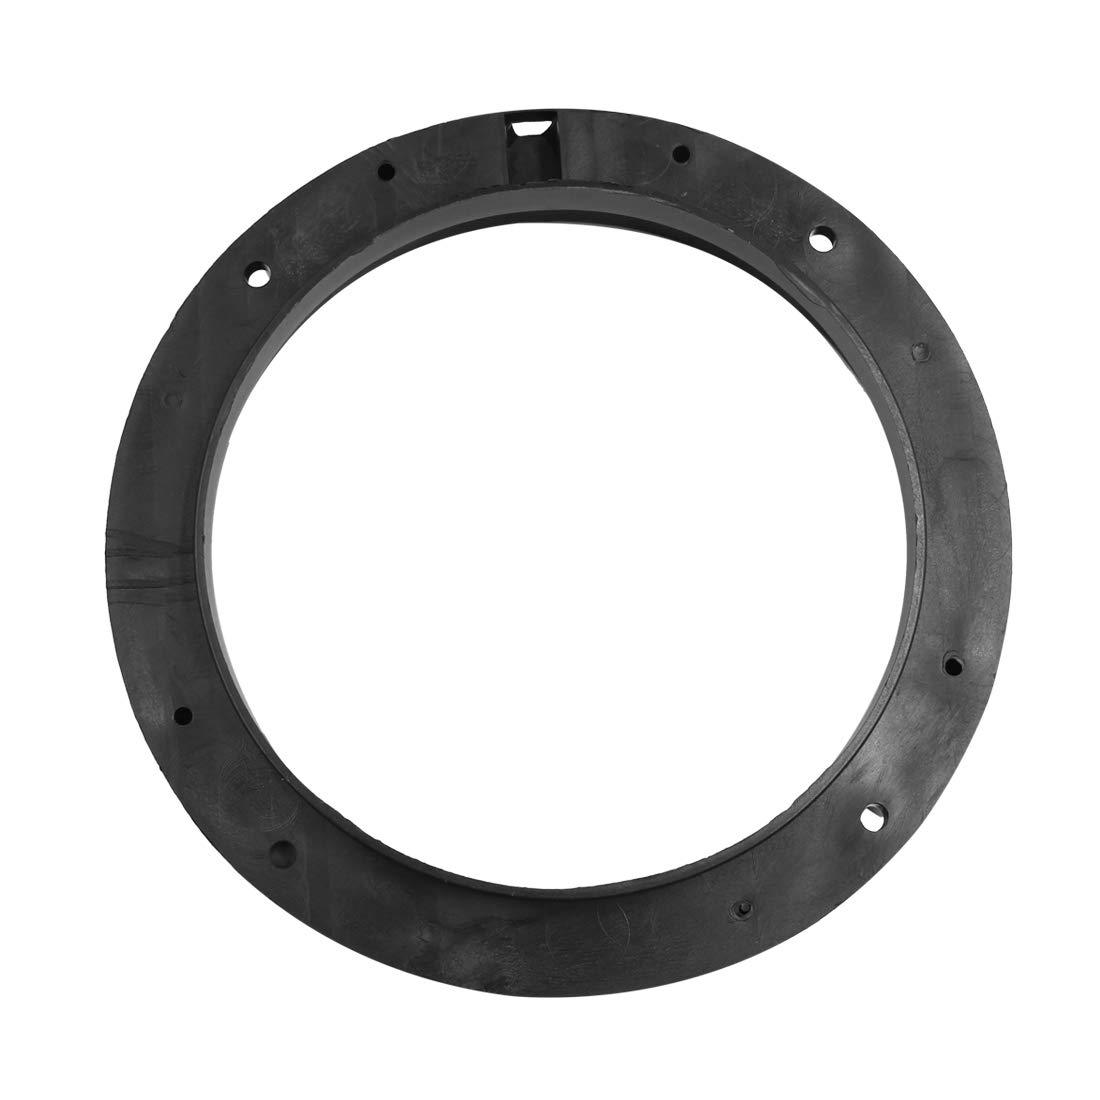 uxcell/® 6.5 inch Car Black Plastic Speaker Spacers Round 2 Pcs